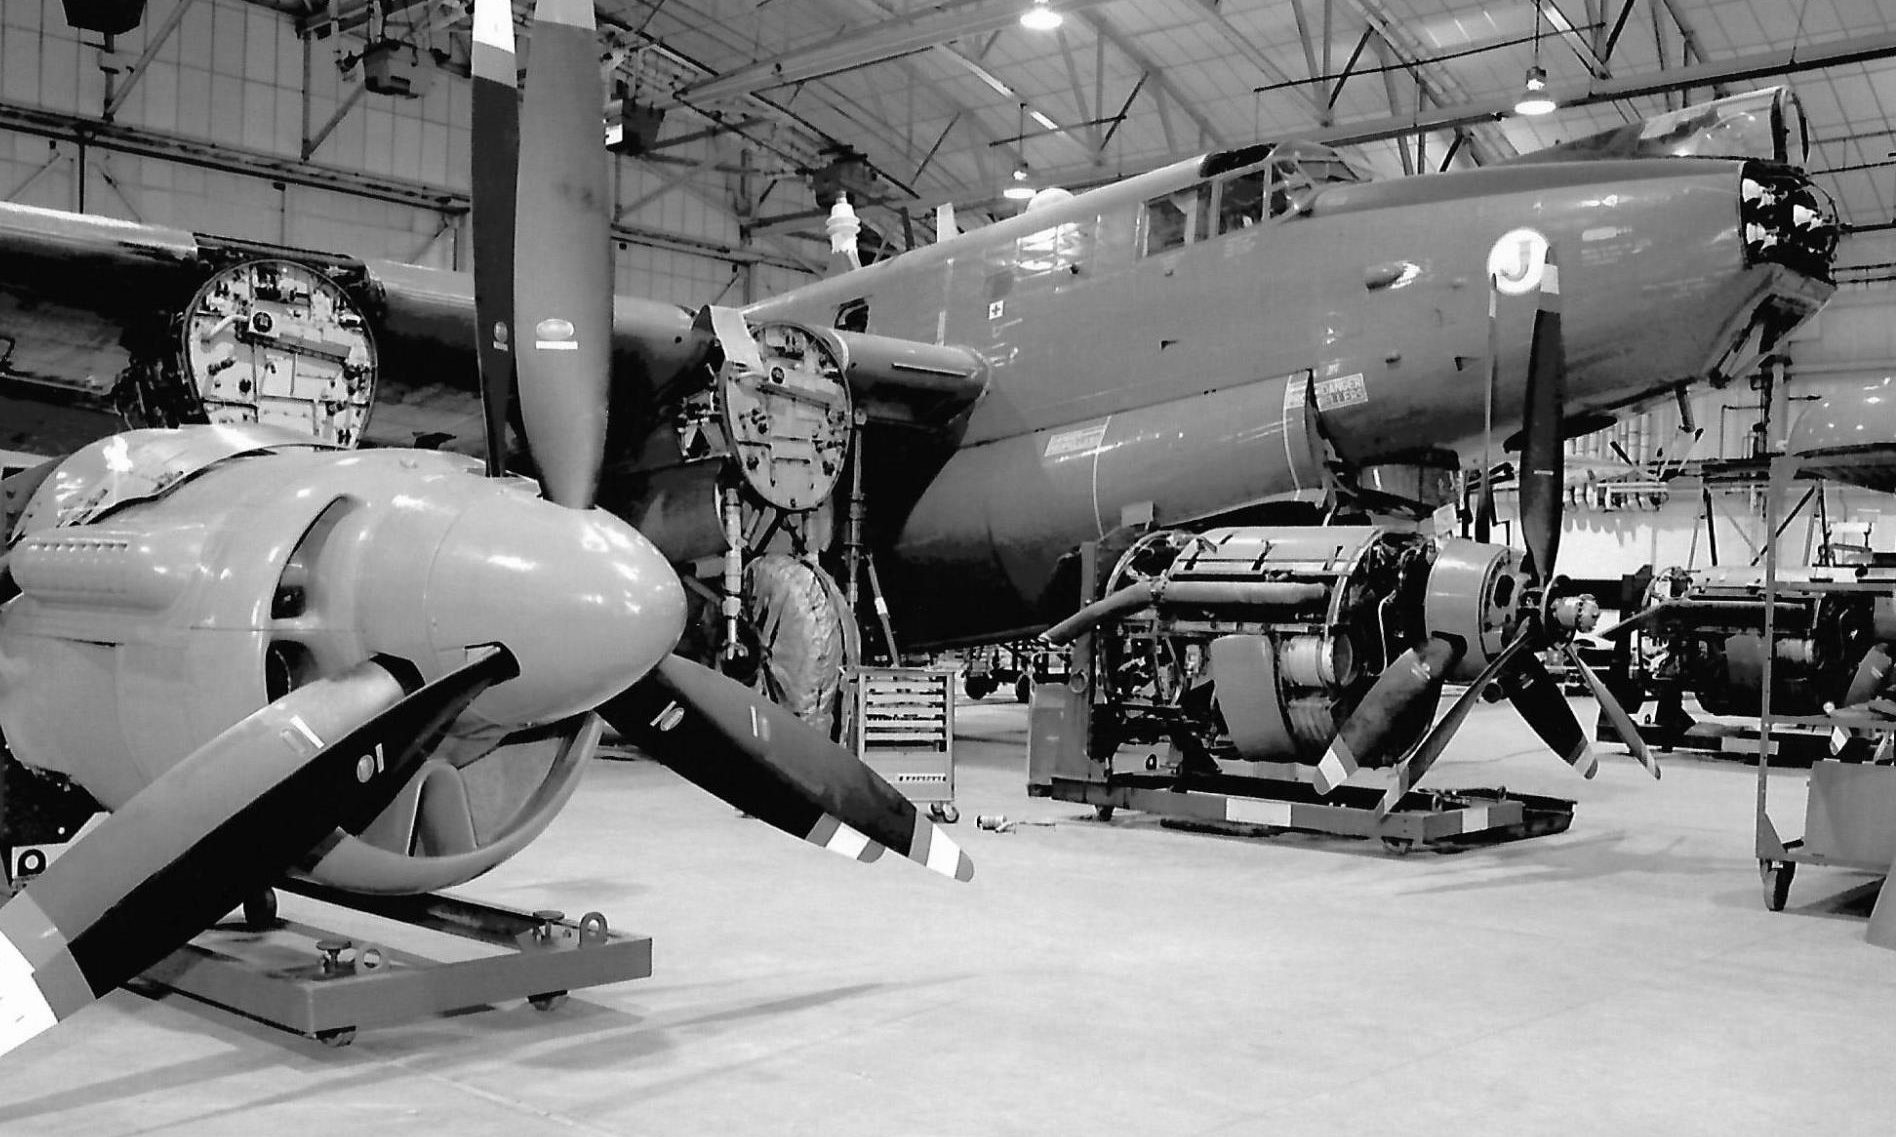 Some of the Shackleton aircraft at RAF Lossiemouth.